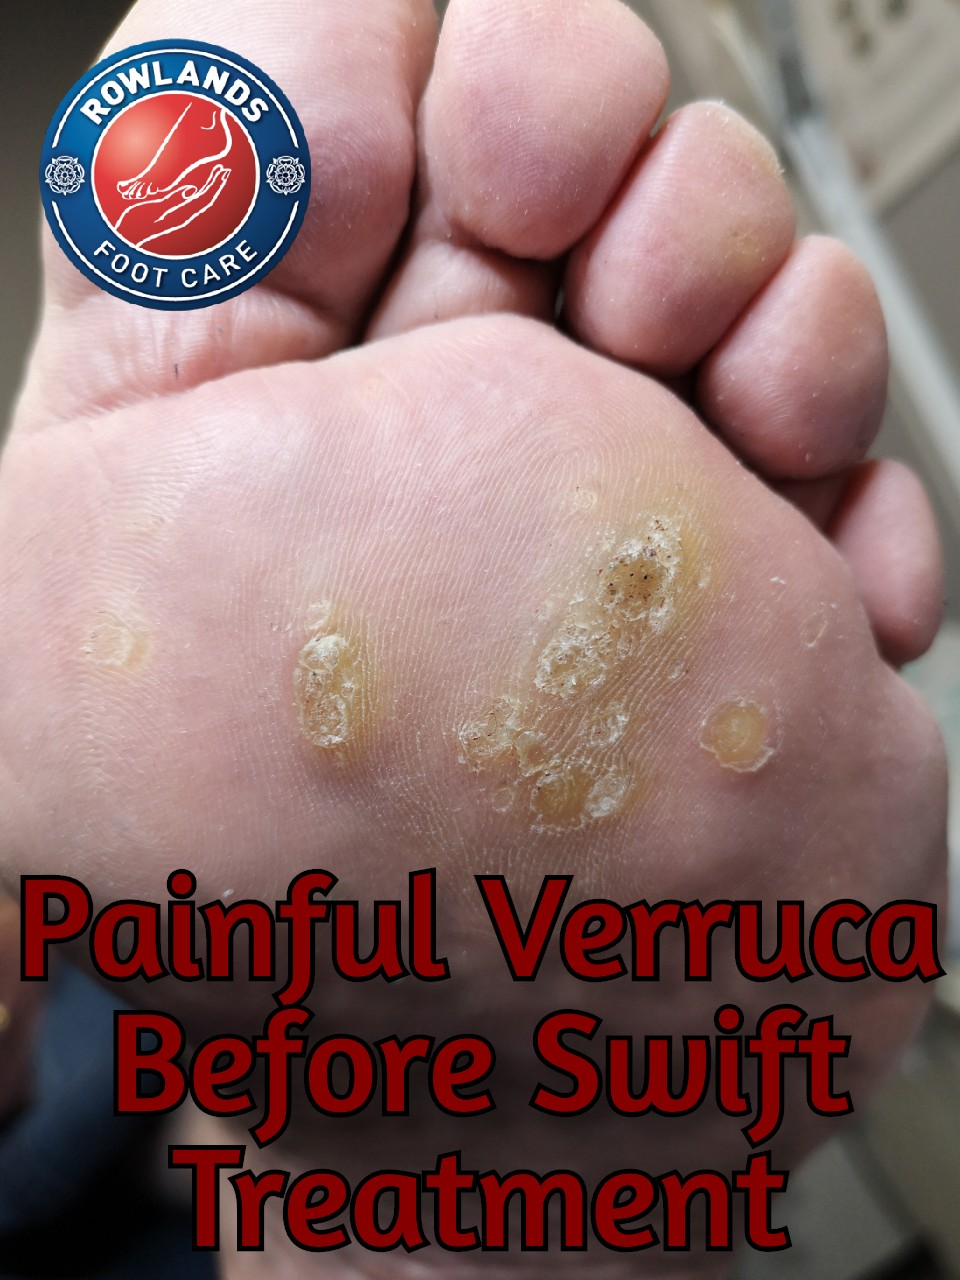 Painful Verruca Before Swift Treatment